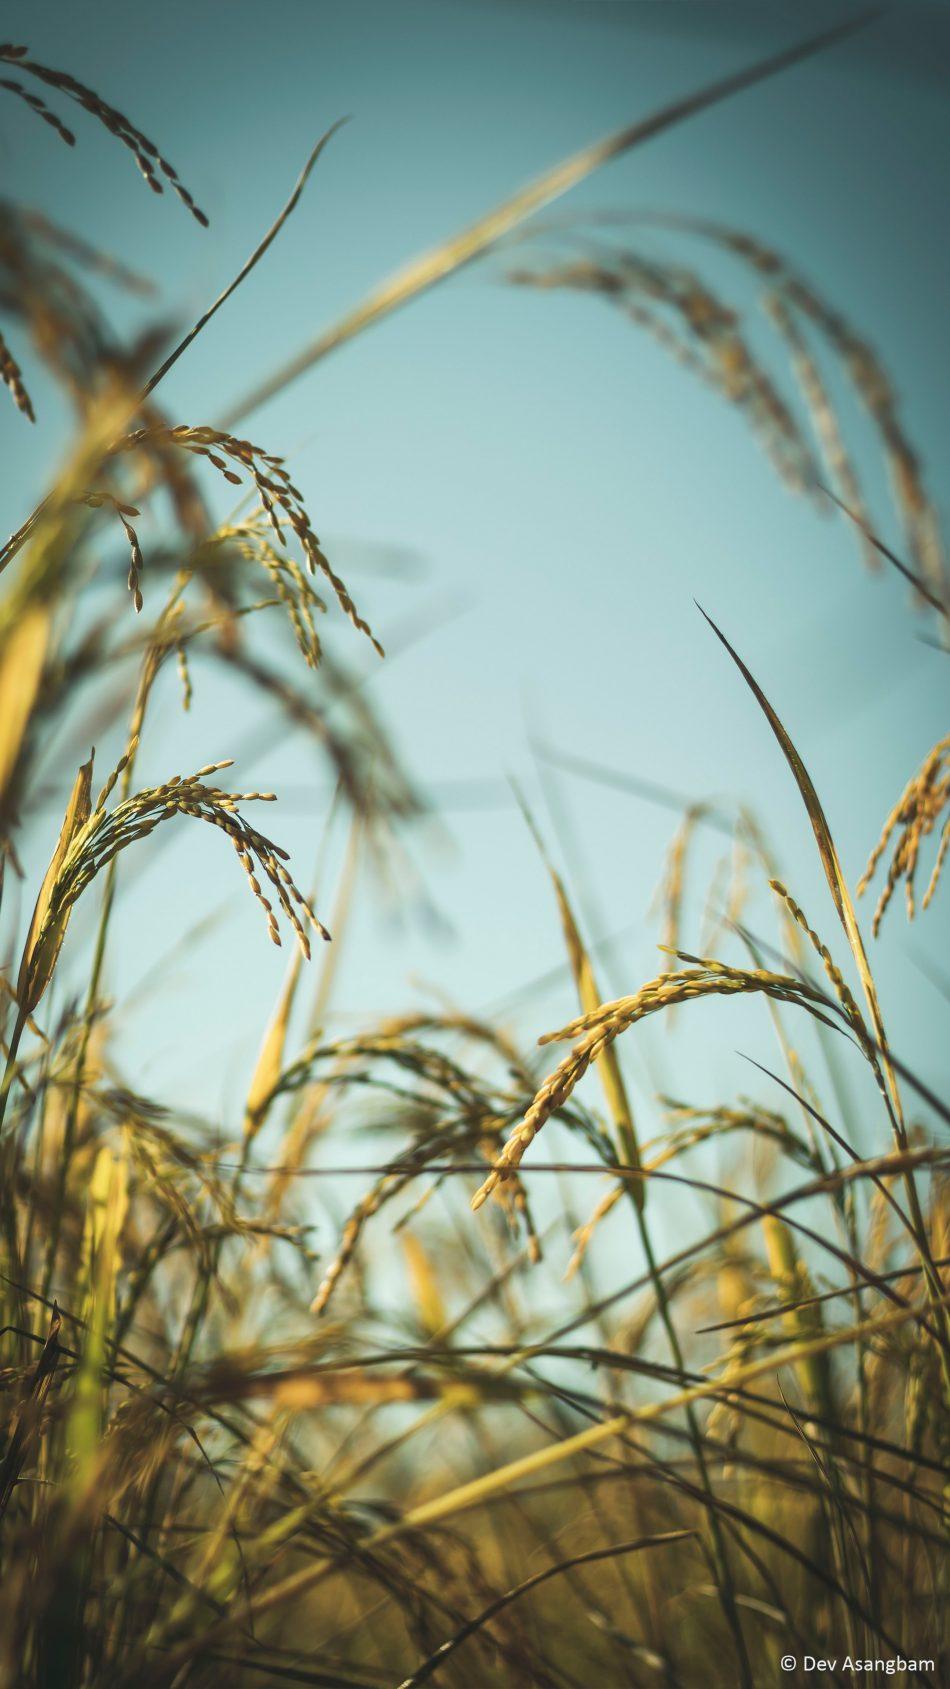 Rice Plants Photography 4K Ultra HD Mobile Wallpaper